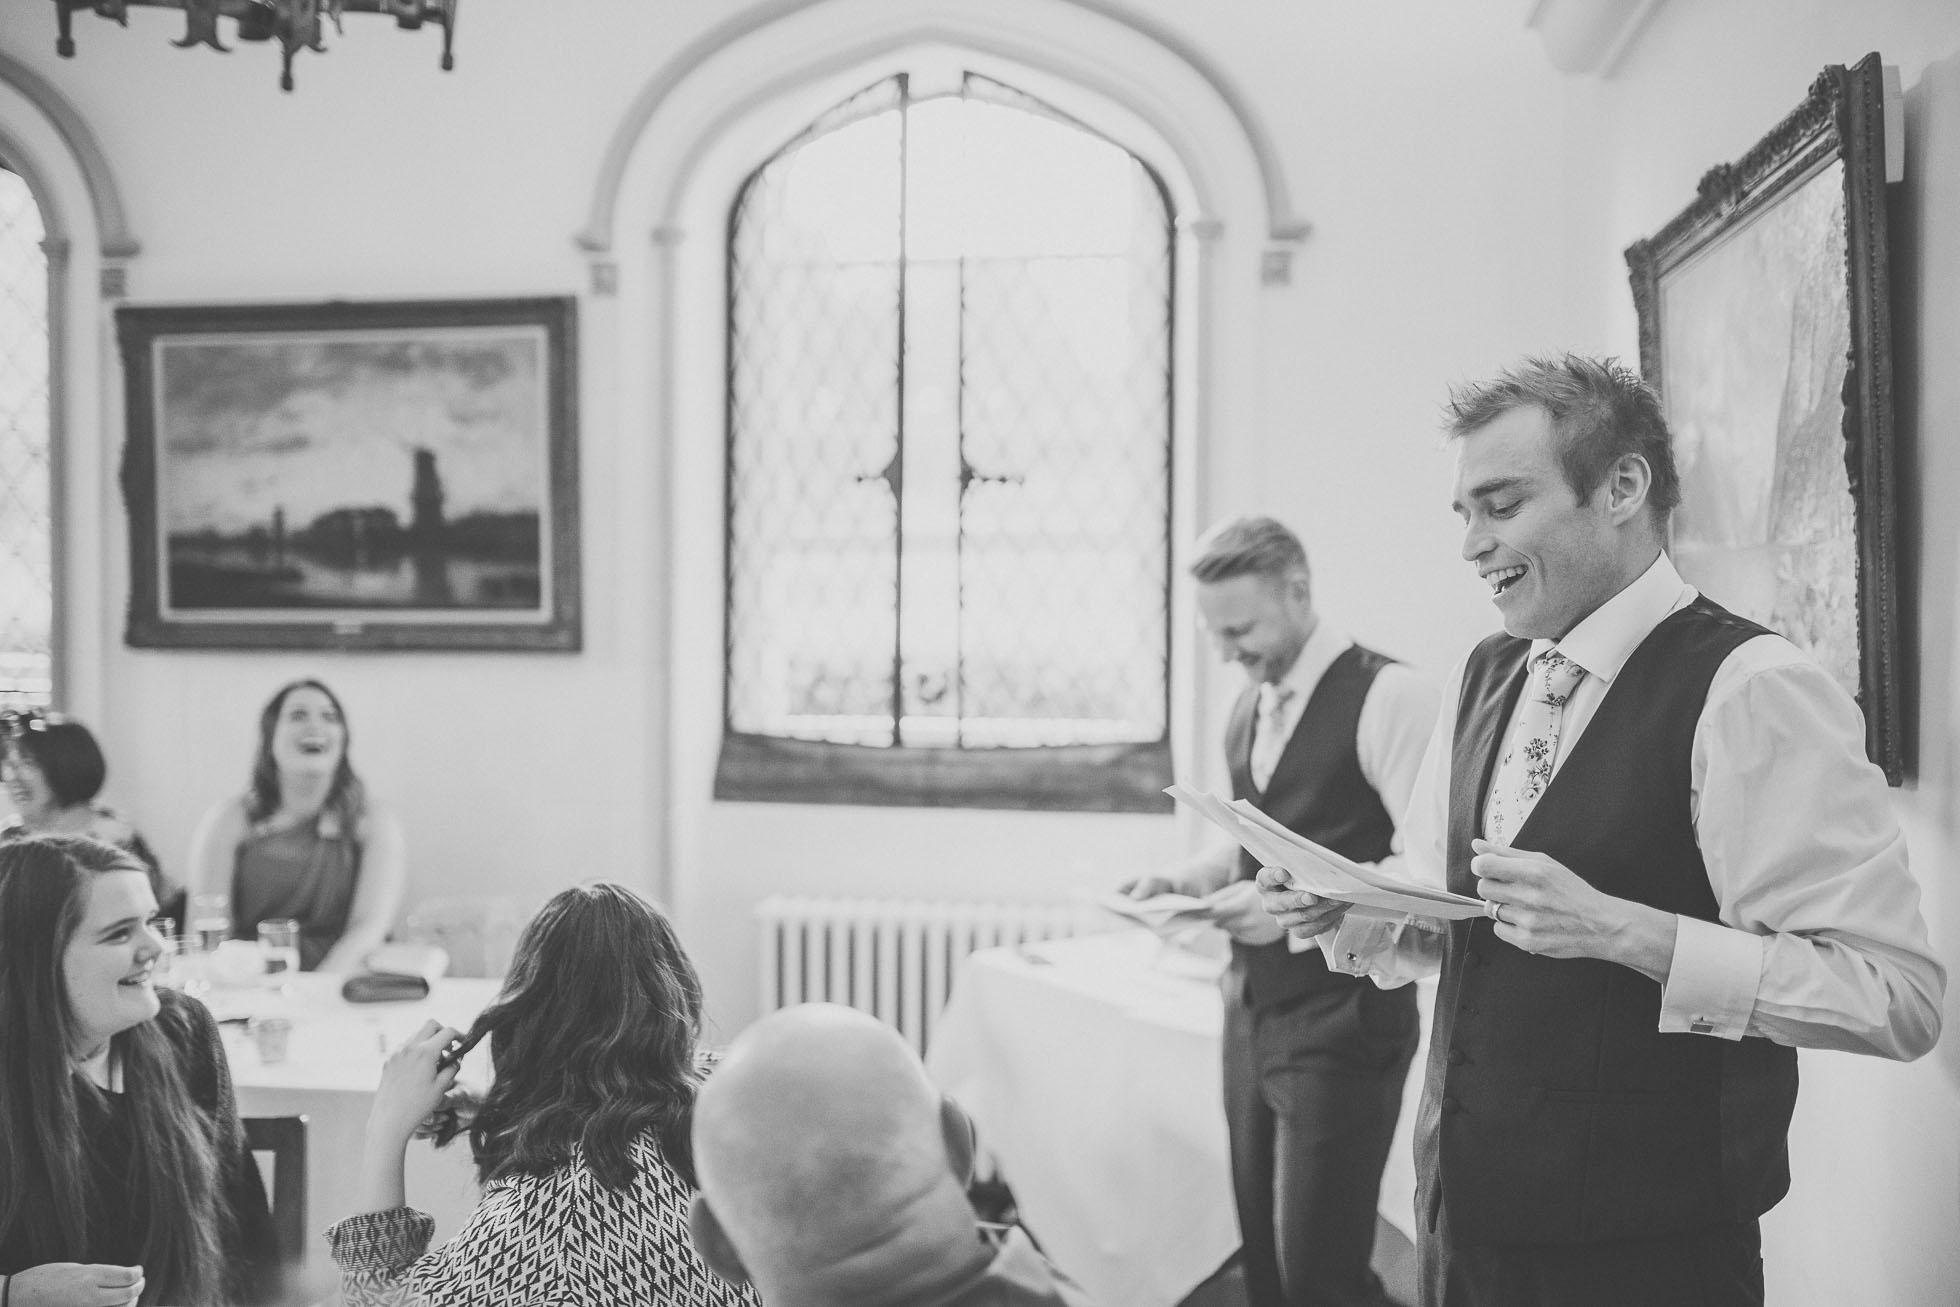 denton-hall-wedding-photographer-59.jpg